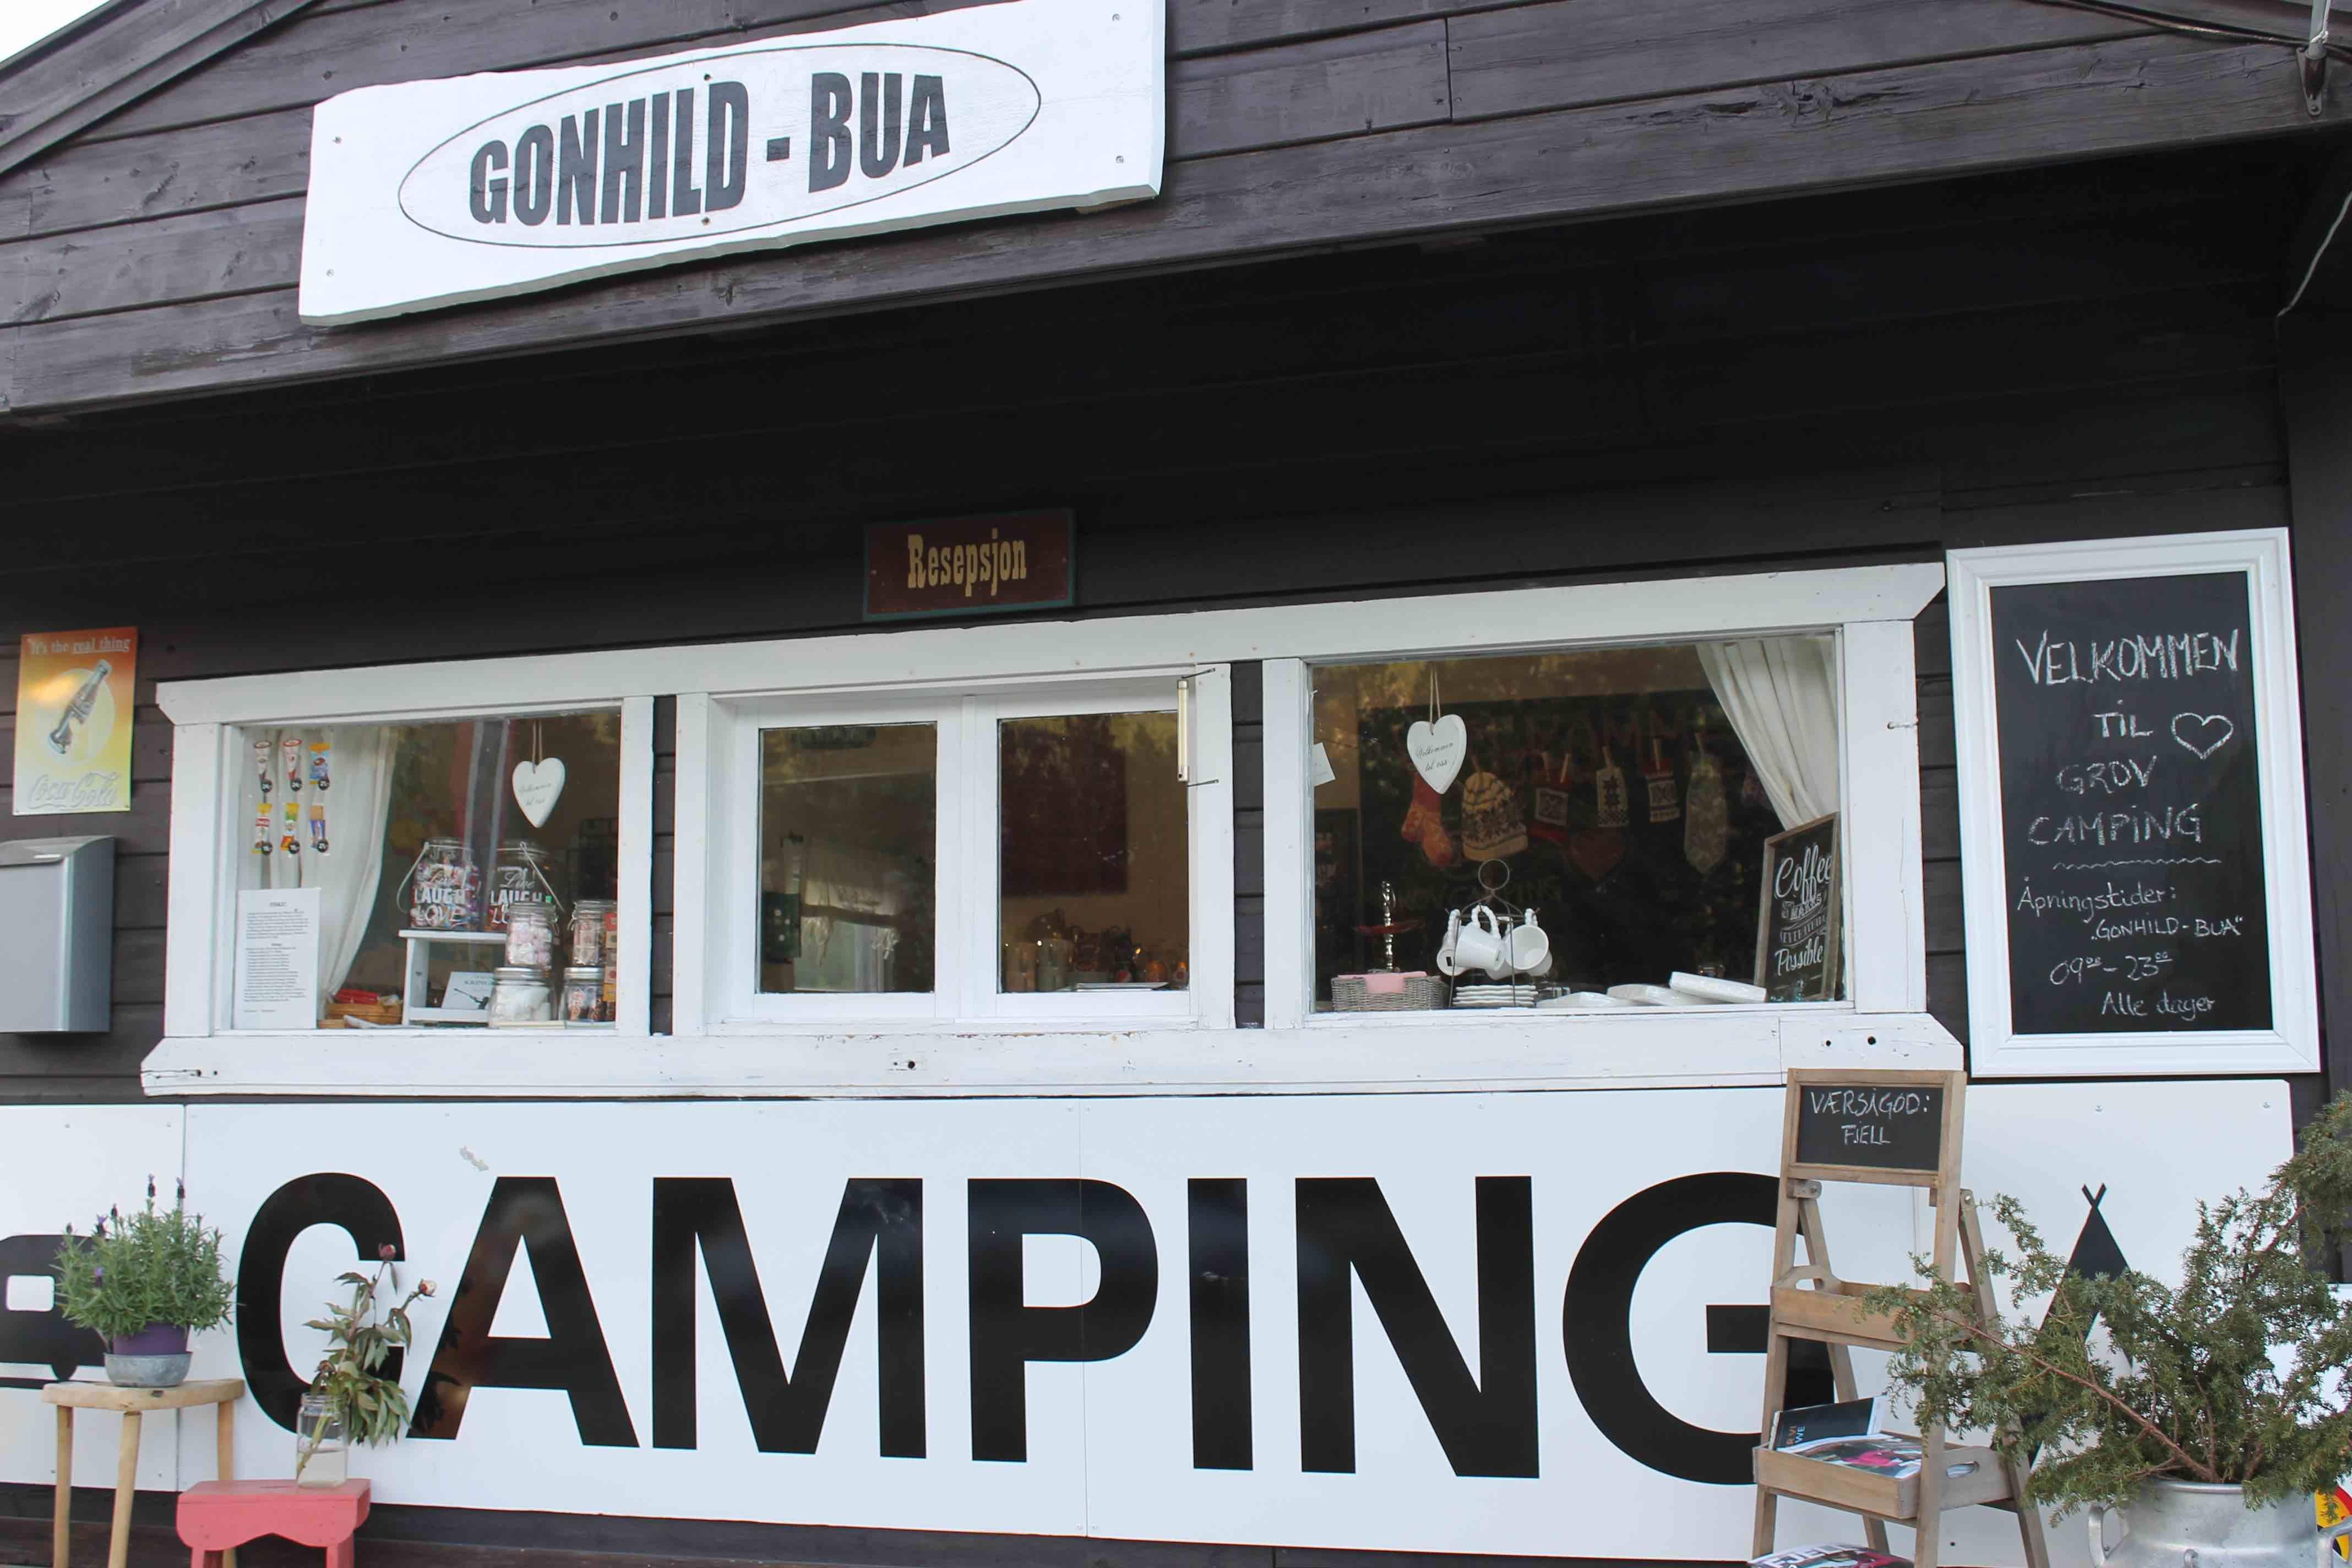 Grov Camping